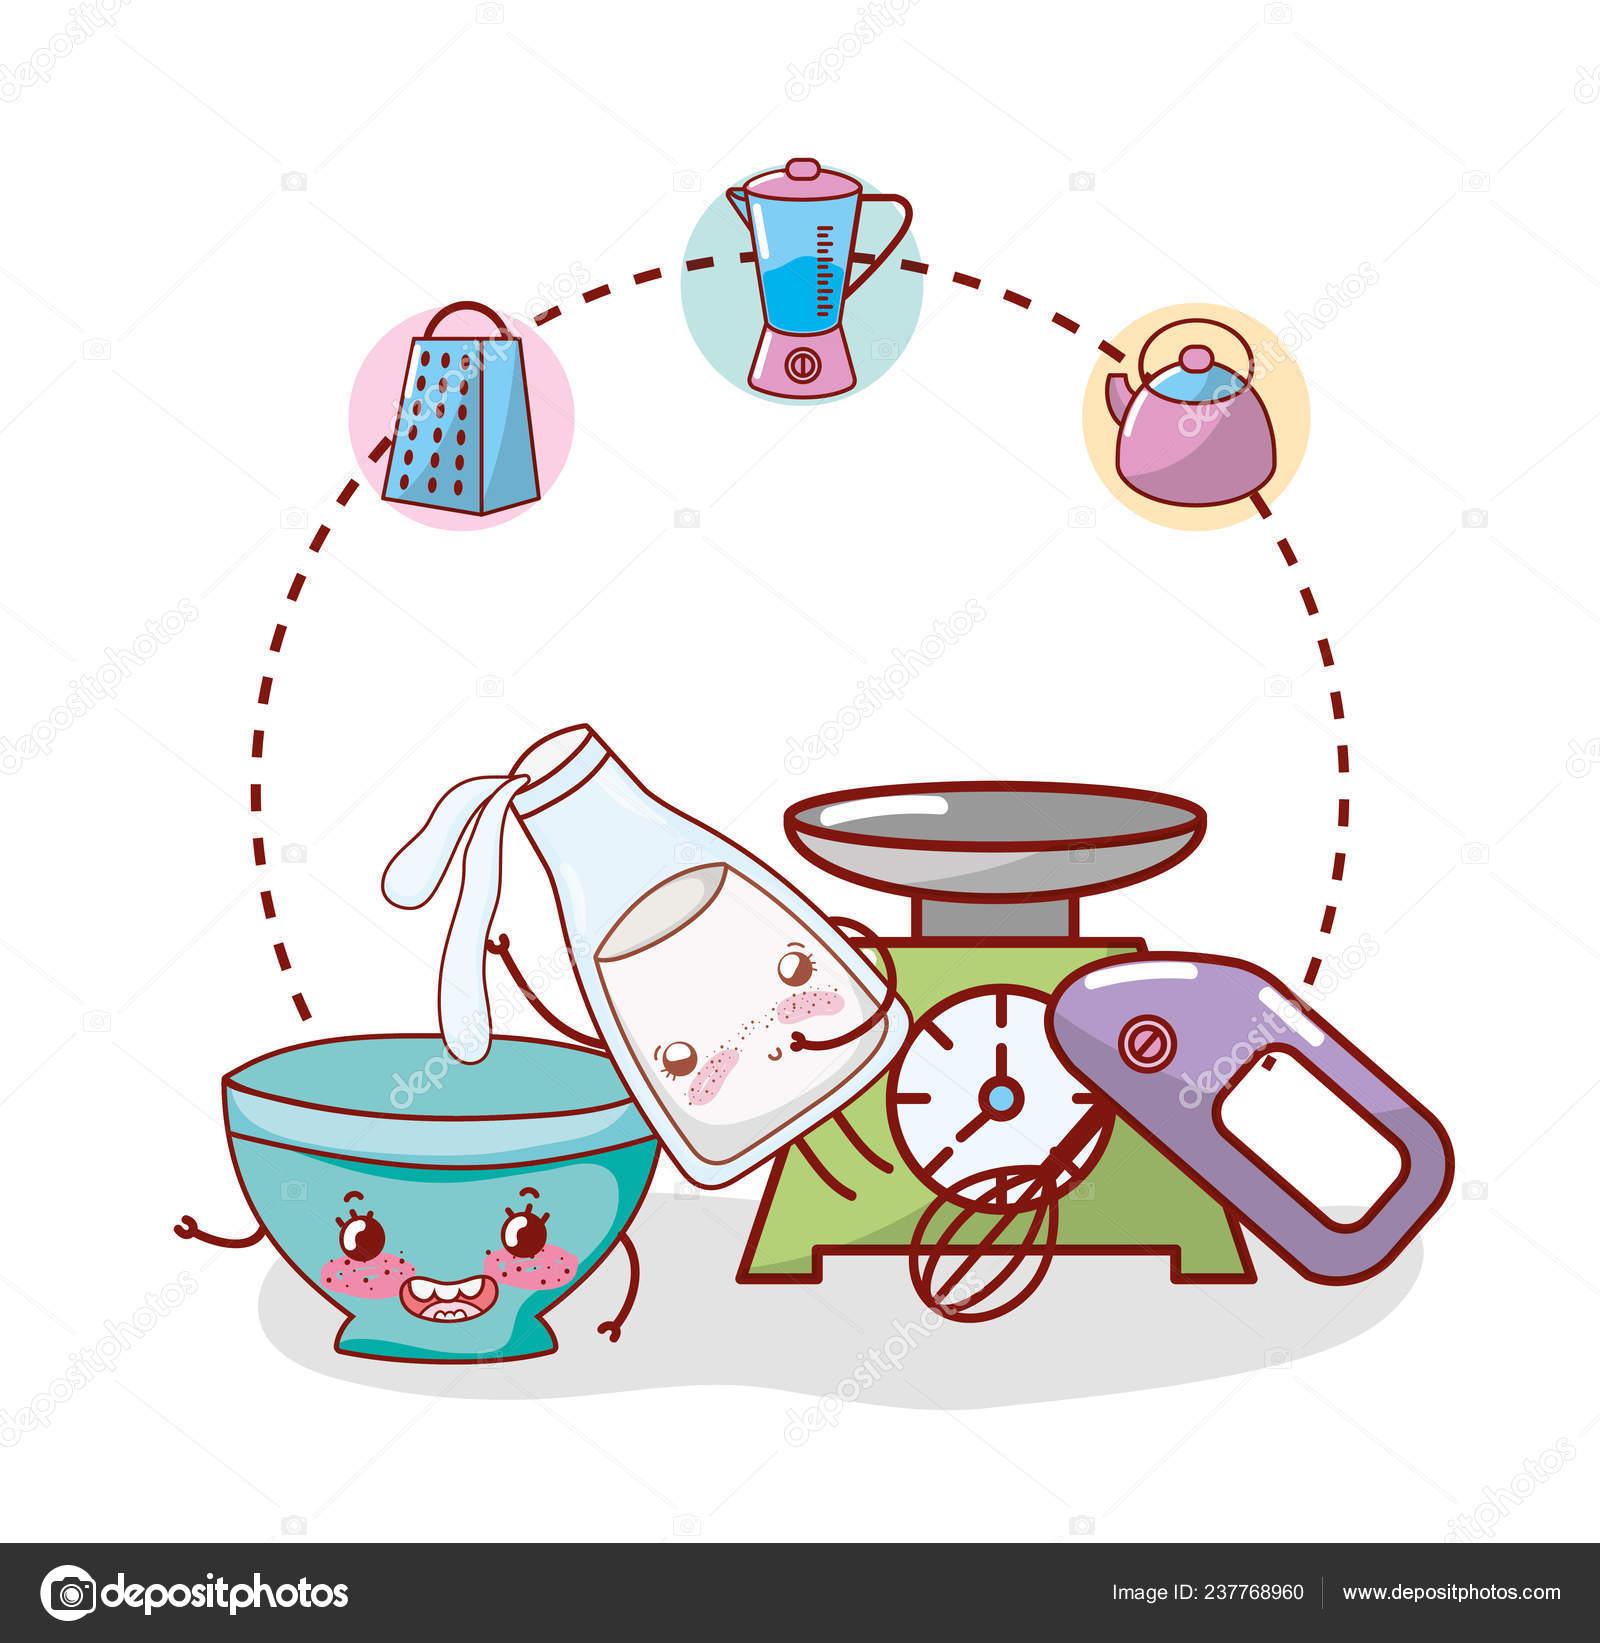 Kitchenware Utensils Ingredients Icons Cartoon Kawaii Cute Cartoon